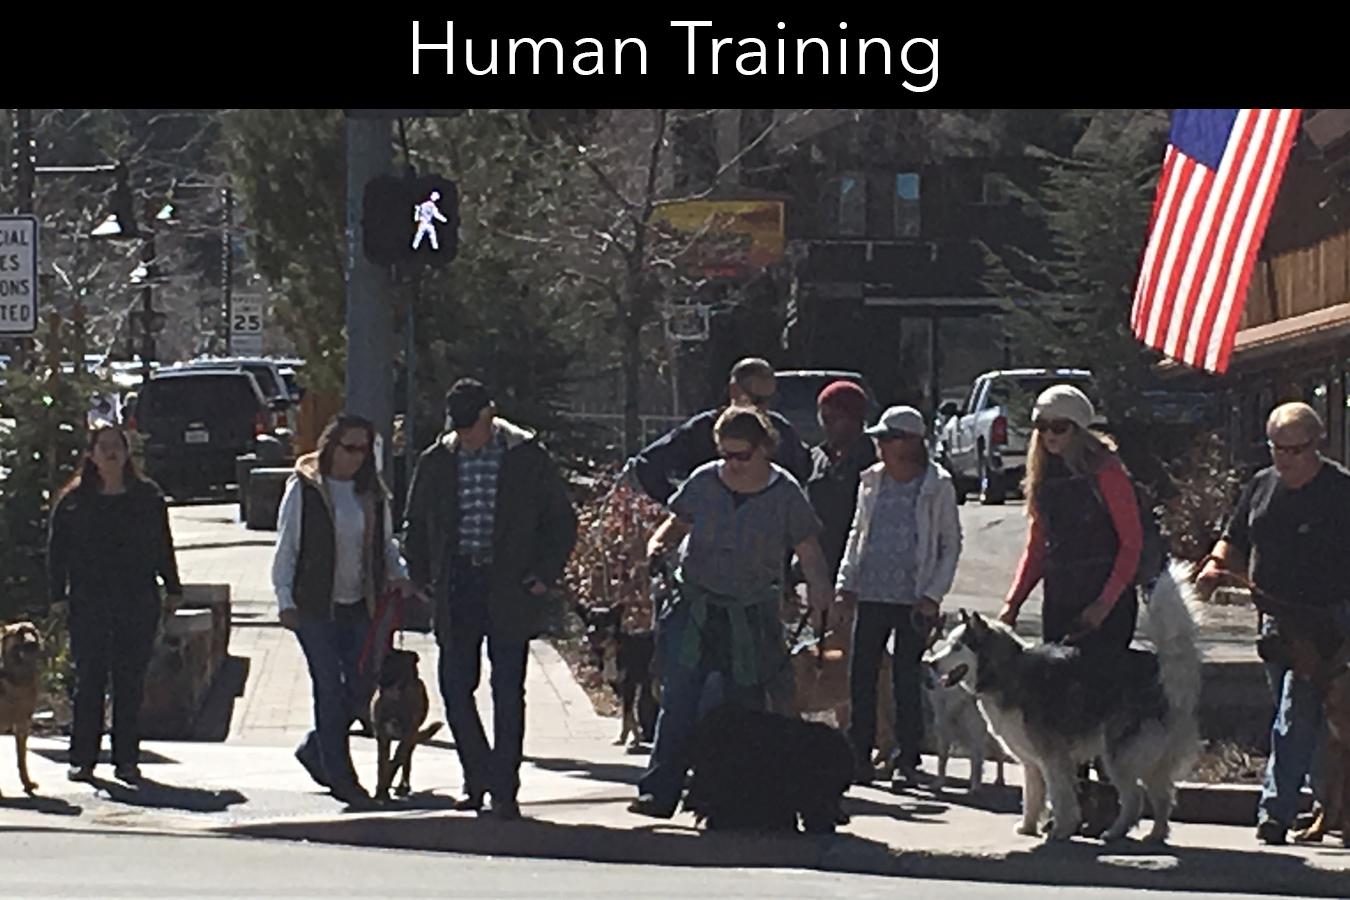 Human Training